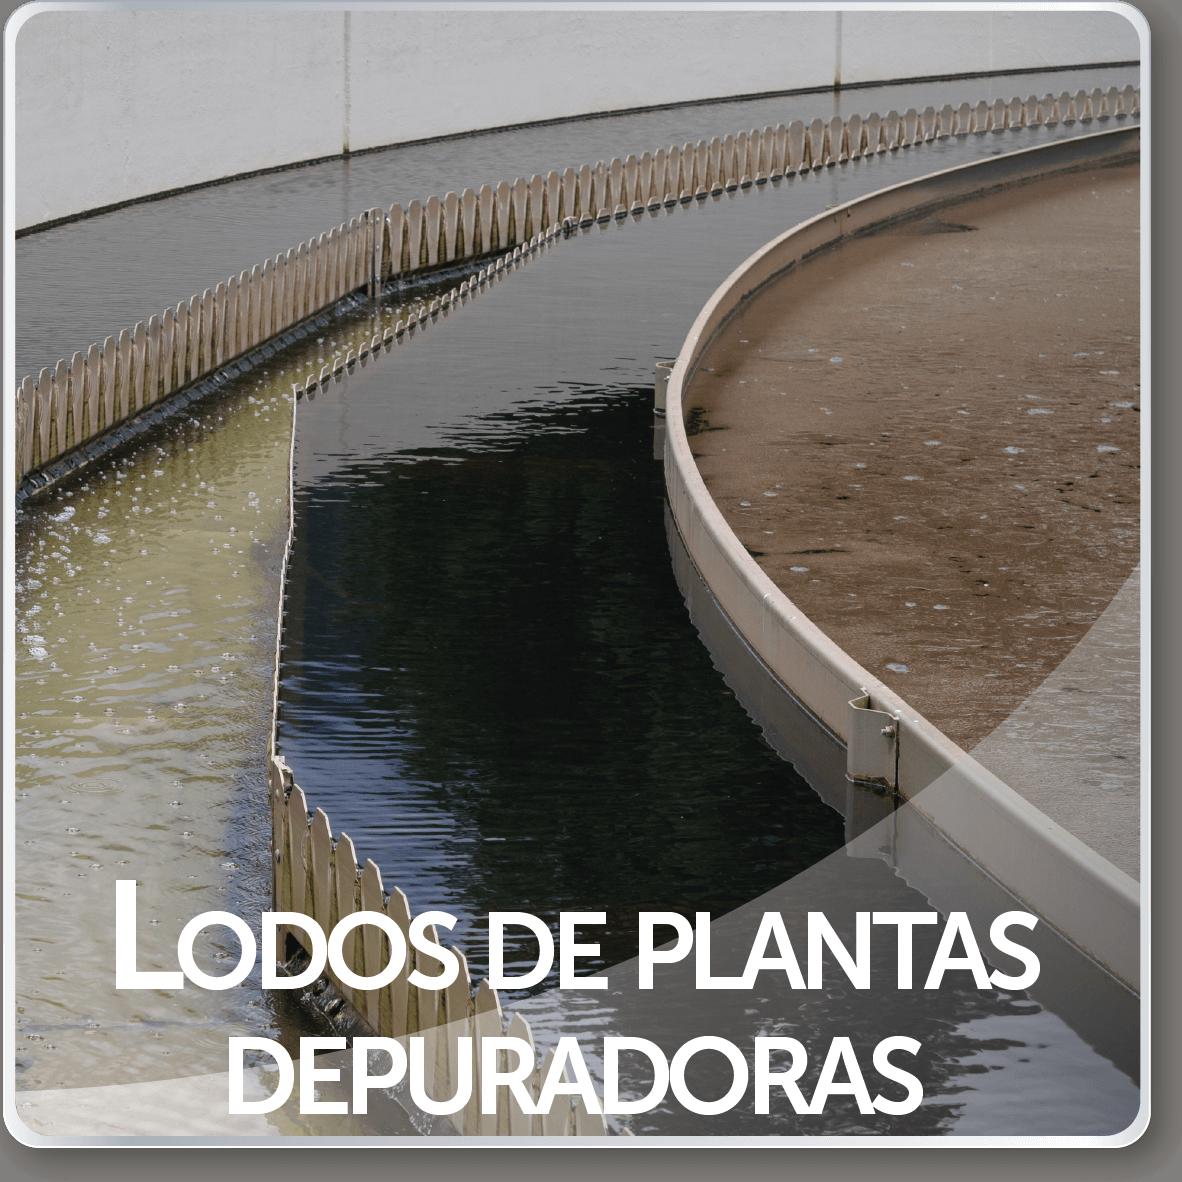 lodos de plantas depuradoras